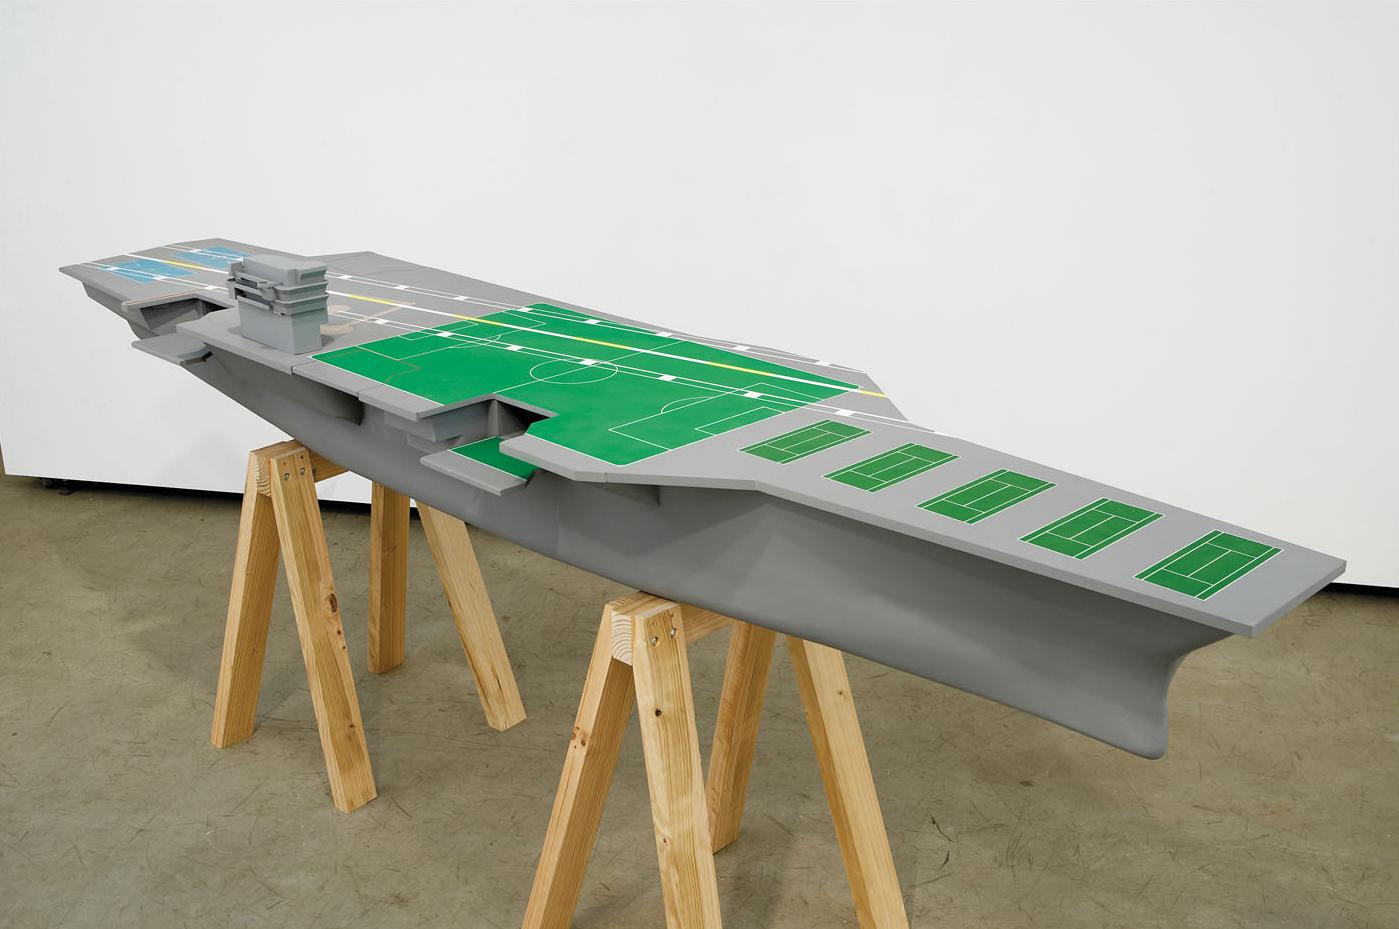 GAMESMANSHIP Enamel on Plywood, Pine 140 x 340 x 78.5 cm